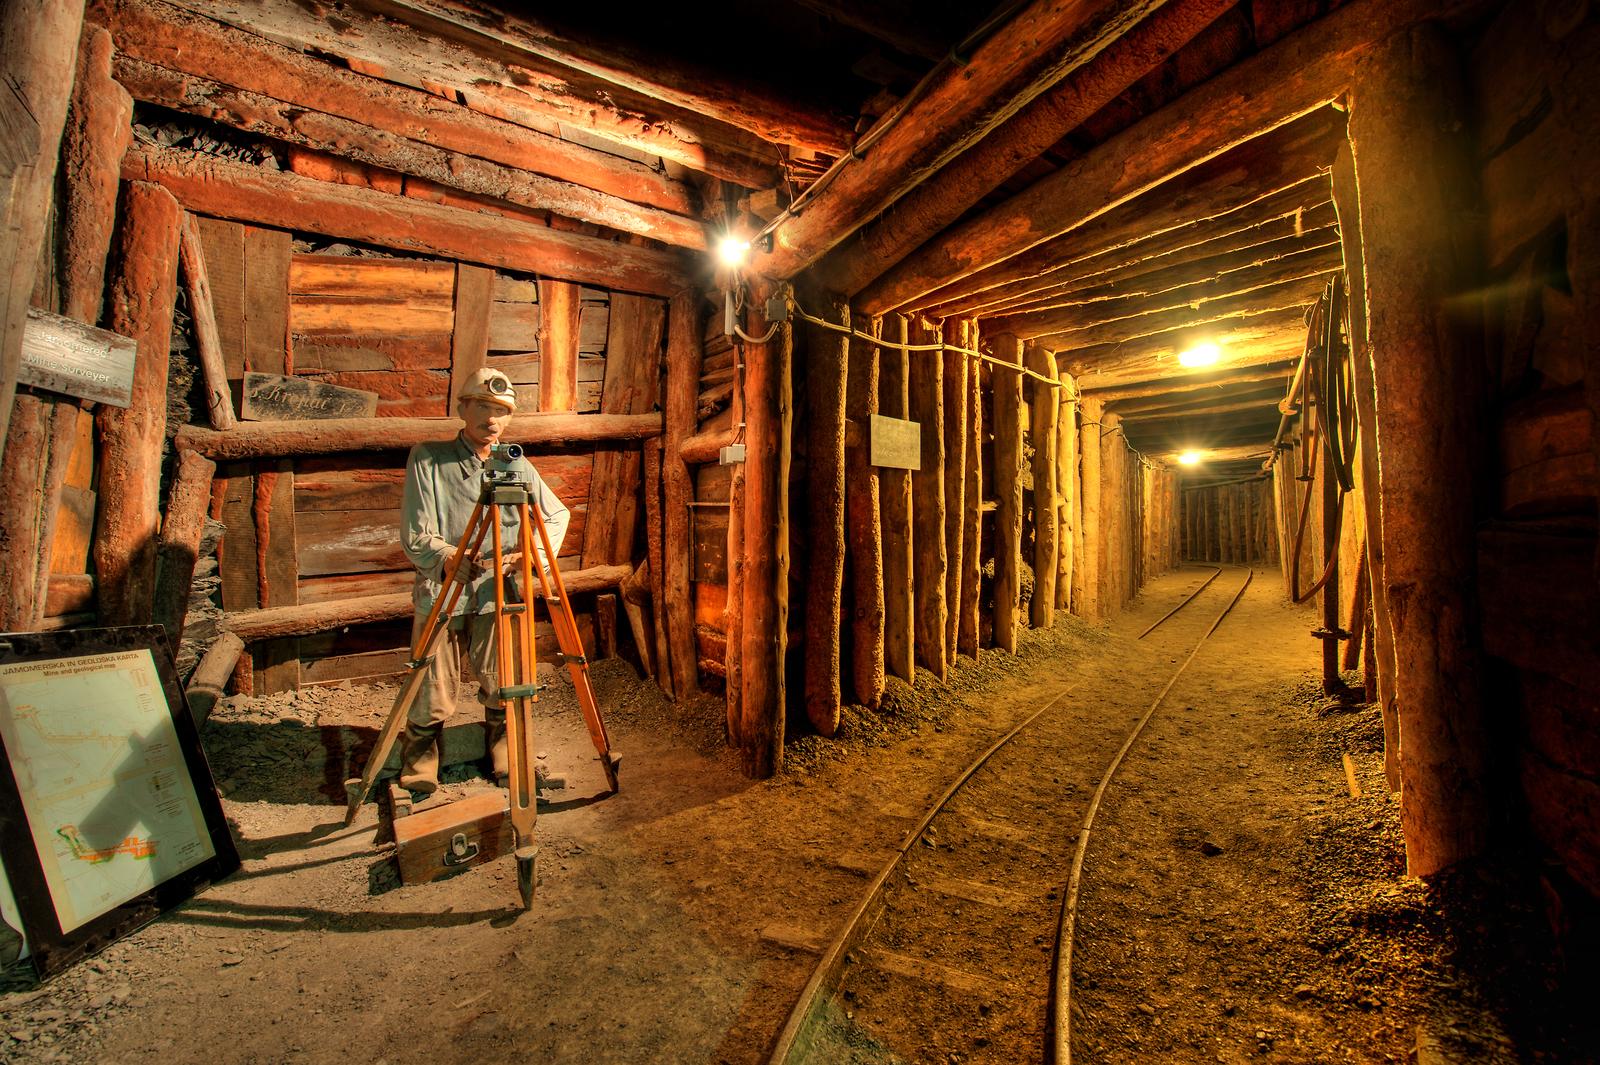 La mina de mercurio Idrija - www.slovenia.info, antonijev_rov_jamomerec_foto_samo_trebizan_arhiv_rzs_orig_jpg-photo